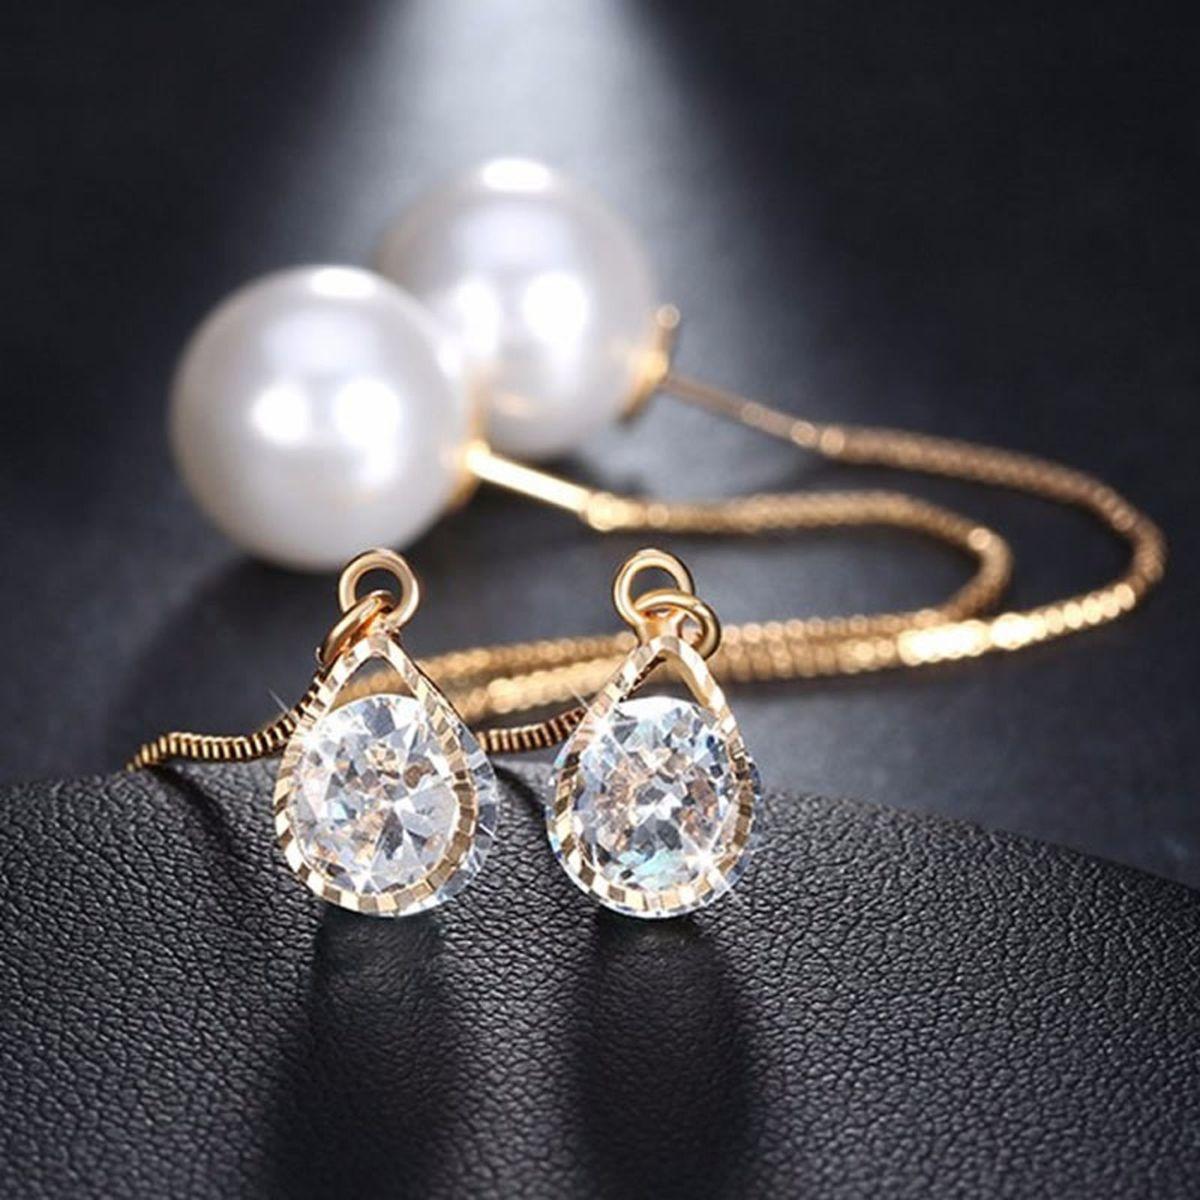 brinco feminino comprido dourado folheado ouro pérola pedra - jóias pierre  semijoias 4169d293ad